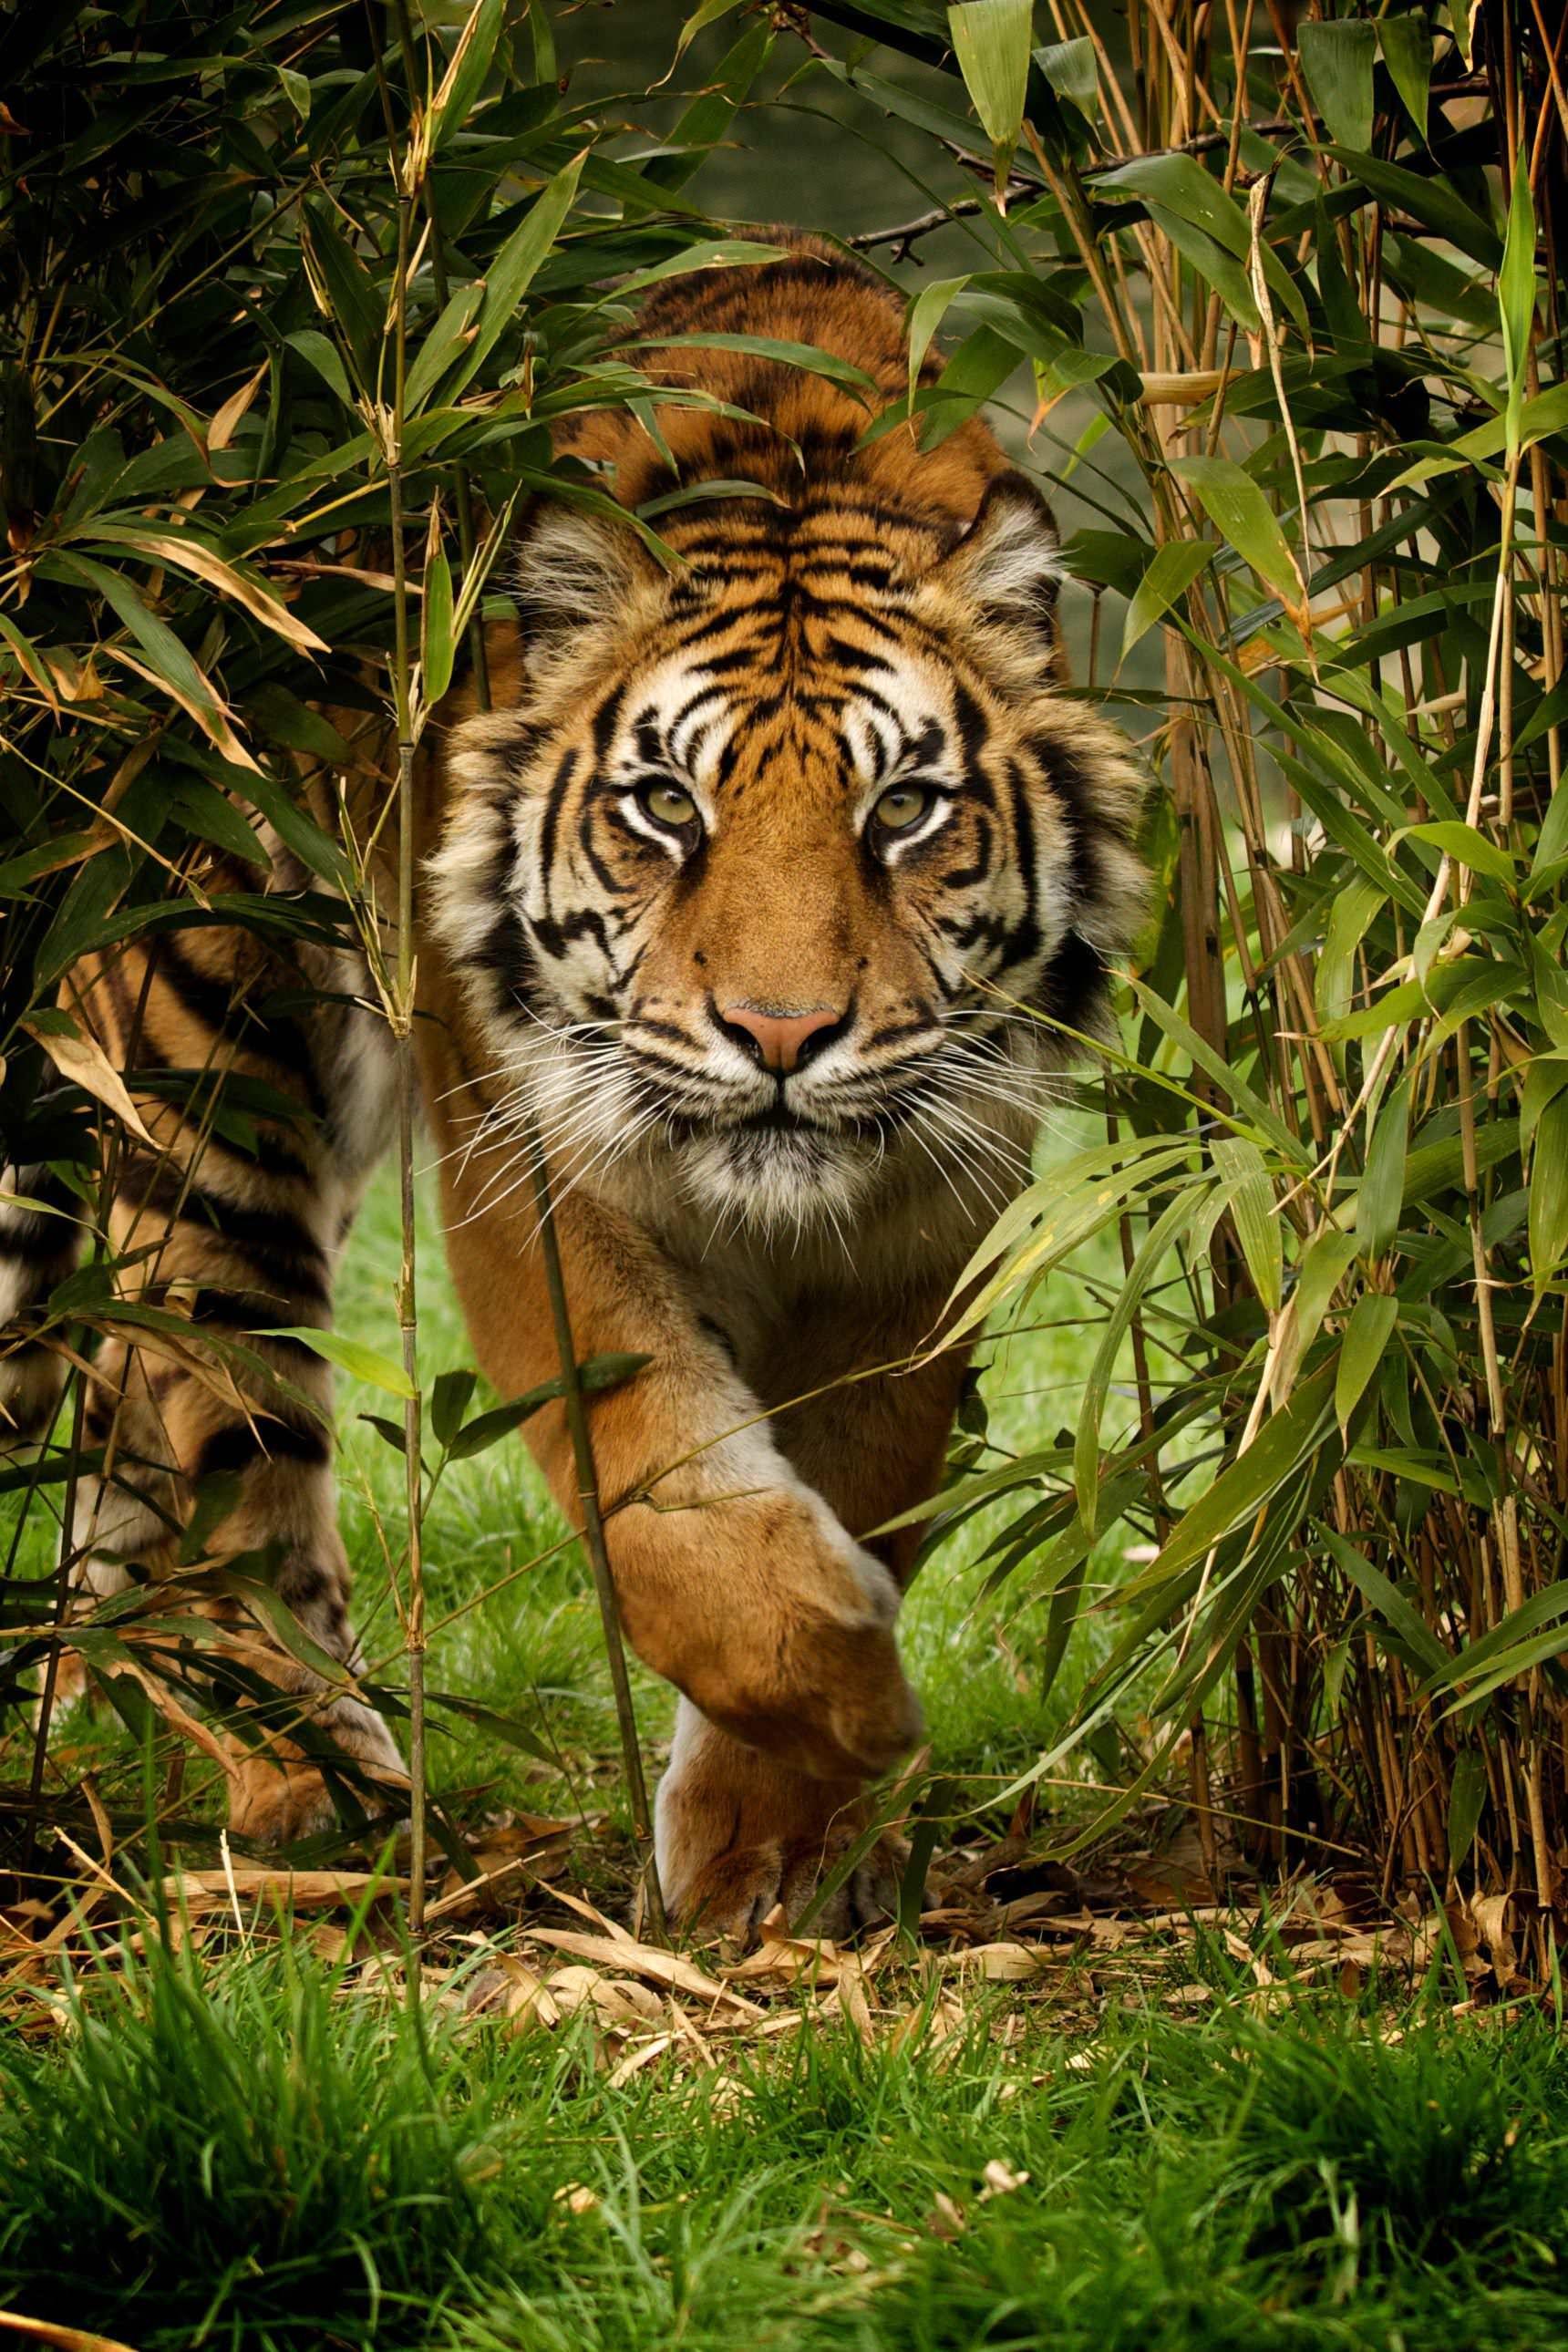 siberian ntiger vs bengal tiger pictures Animals wild